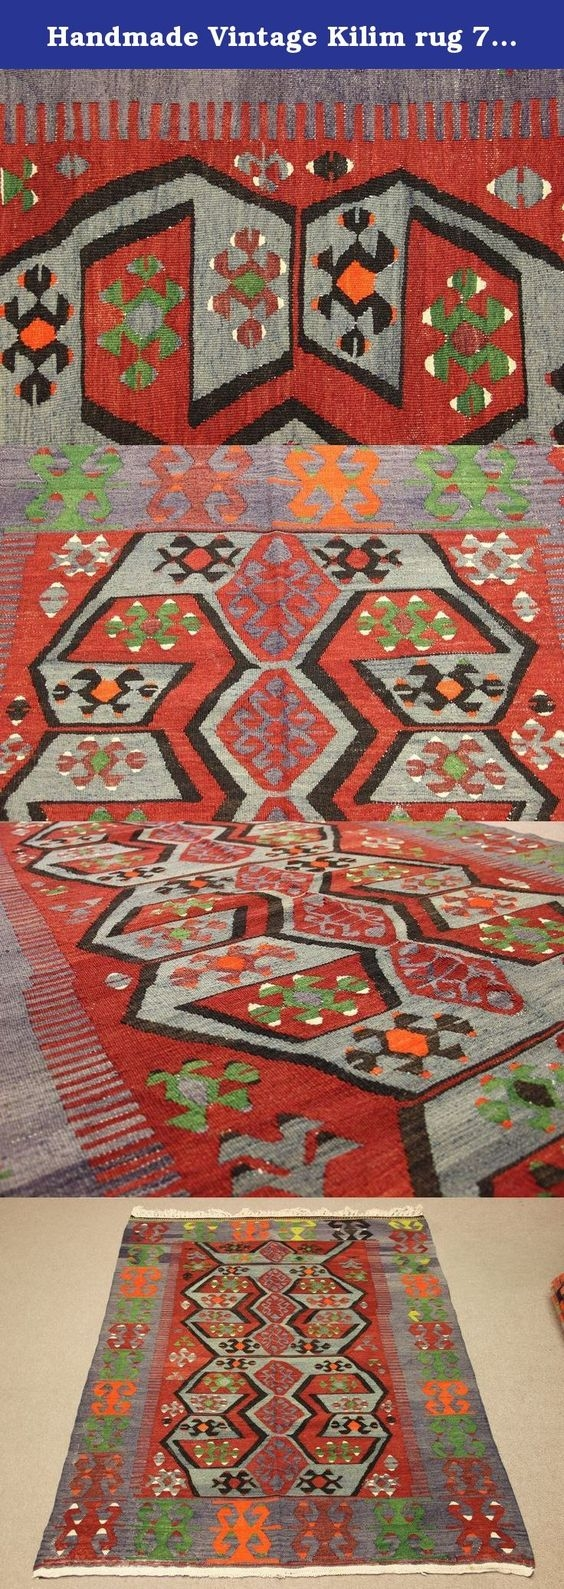 Handmade Vintage Kilim Rug 75×50 Feet Area Rug Floor Rug Turkish In Organic Wool Area Rugs (#8 of 15)